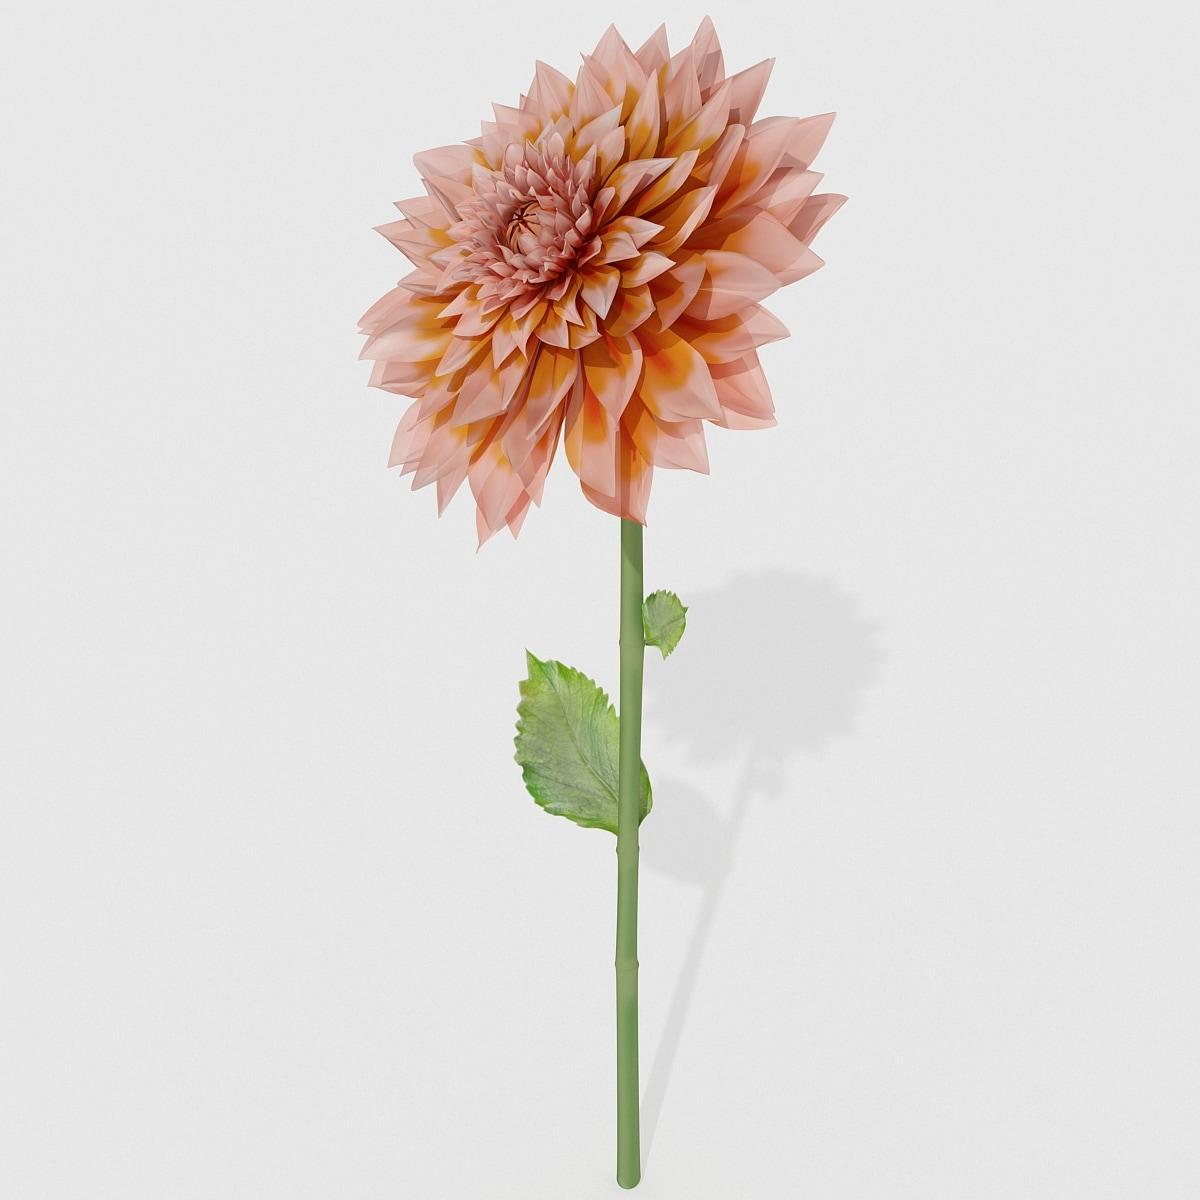 dahlias flower 3d model